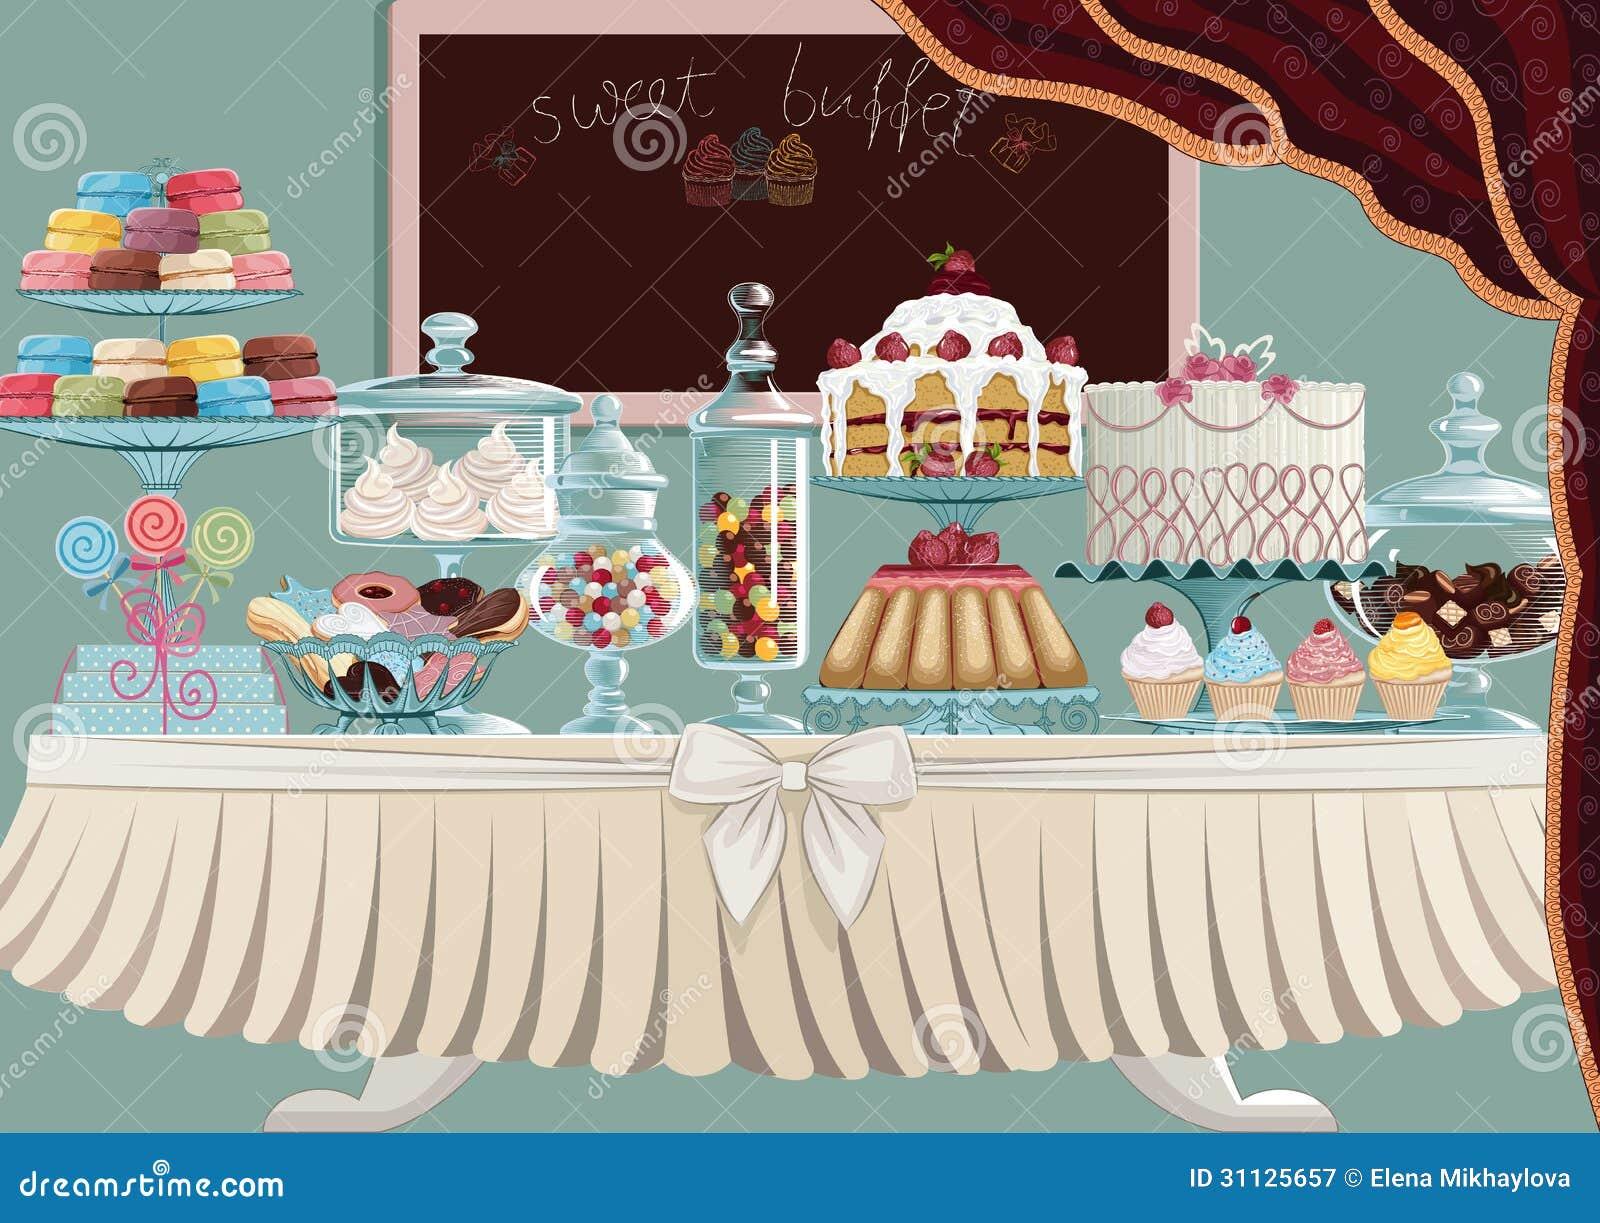 Sweet Treats Royalty Free Stock Photography Image 31125657